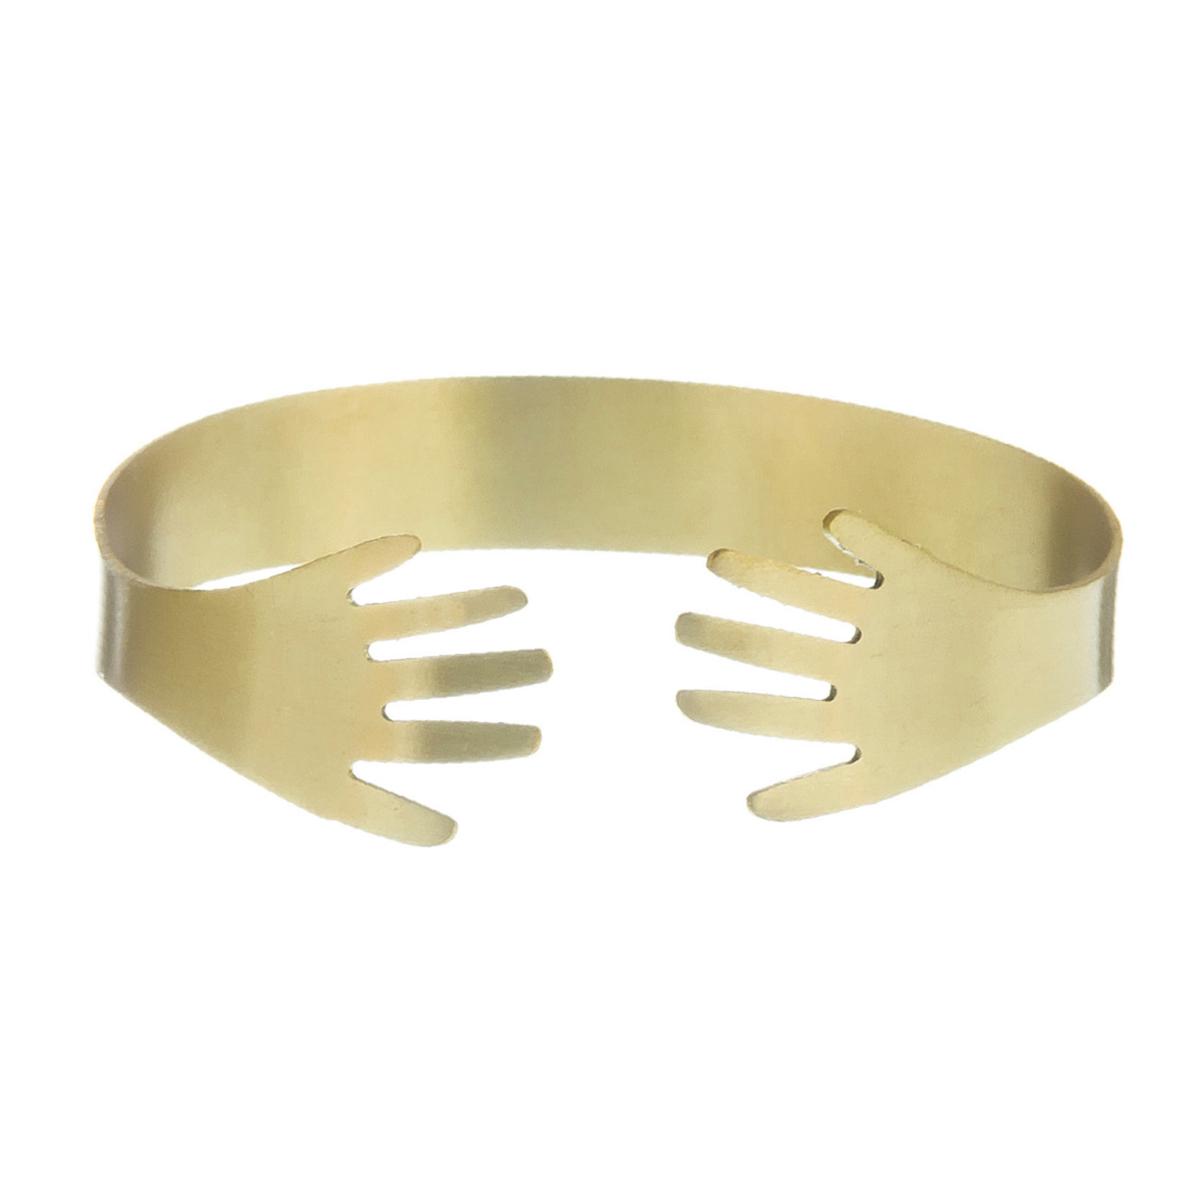 Brass hands bracelet by Sibilia